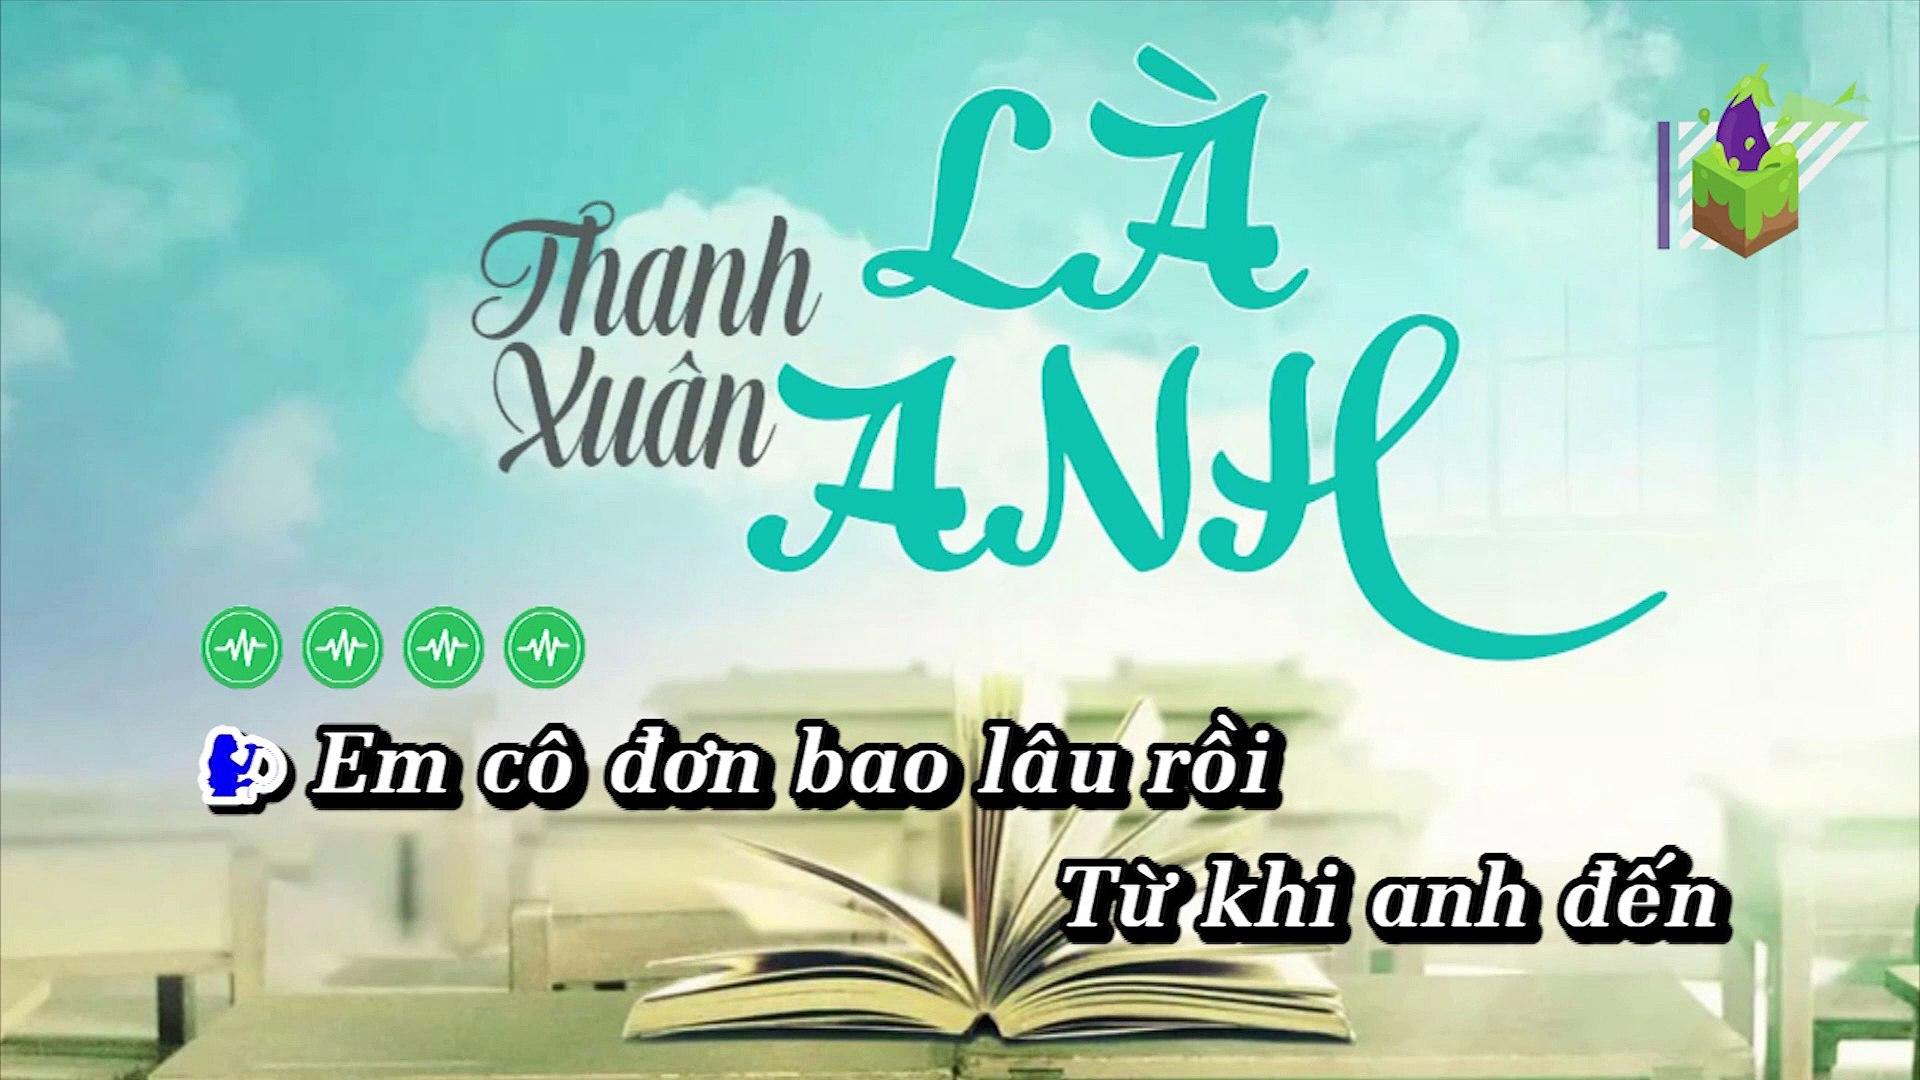 [Karaoke] Thanh Xuân Là Anh - 2T Ft. Ndiên, Shenlongz [Beat]